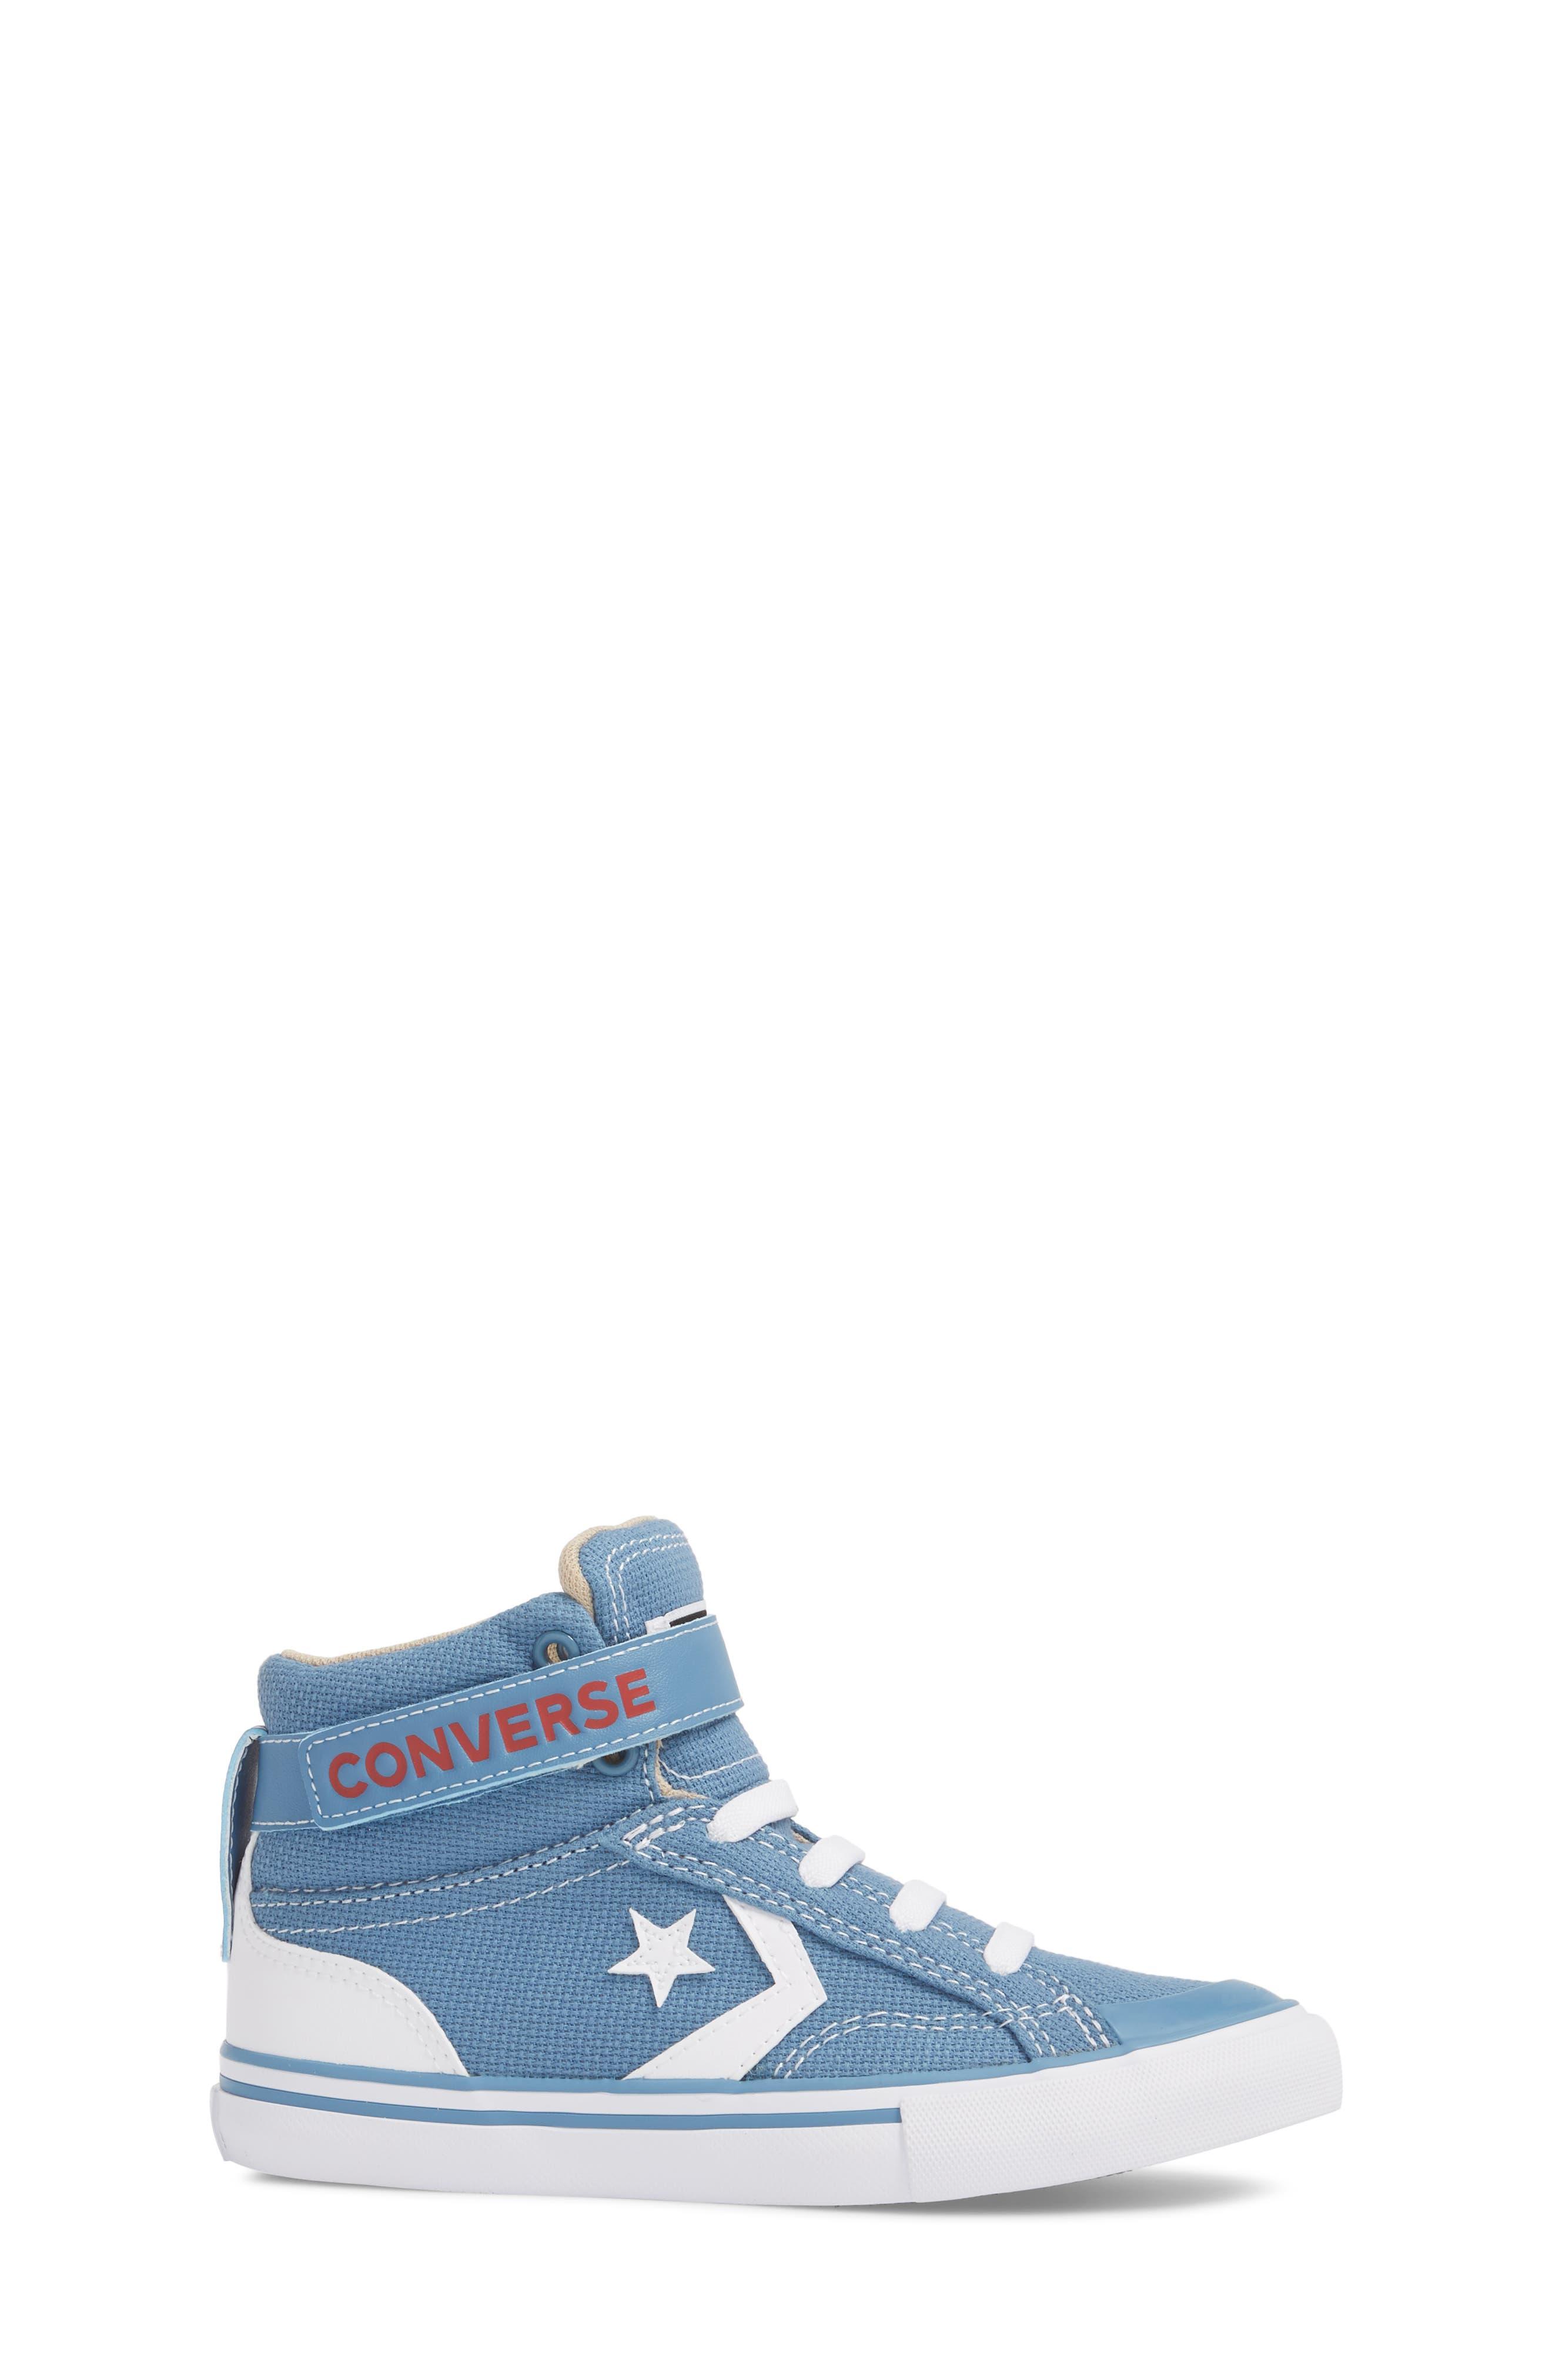 Pro Blaze High Top Sneaker,                             Alternate thumbnail 5, color,